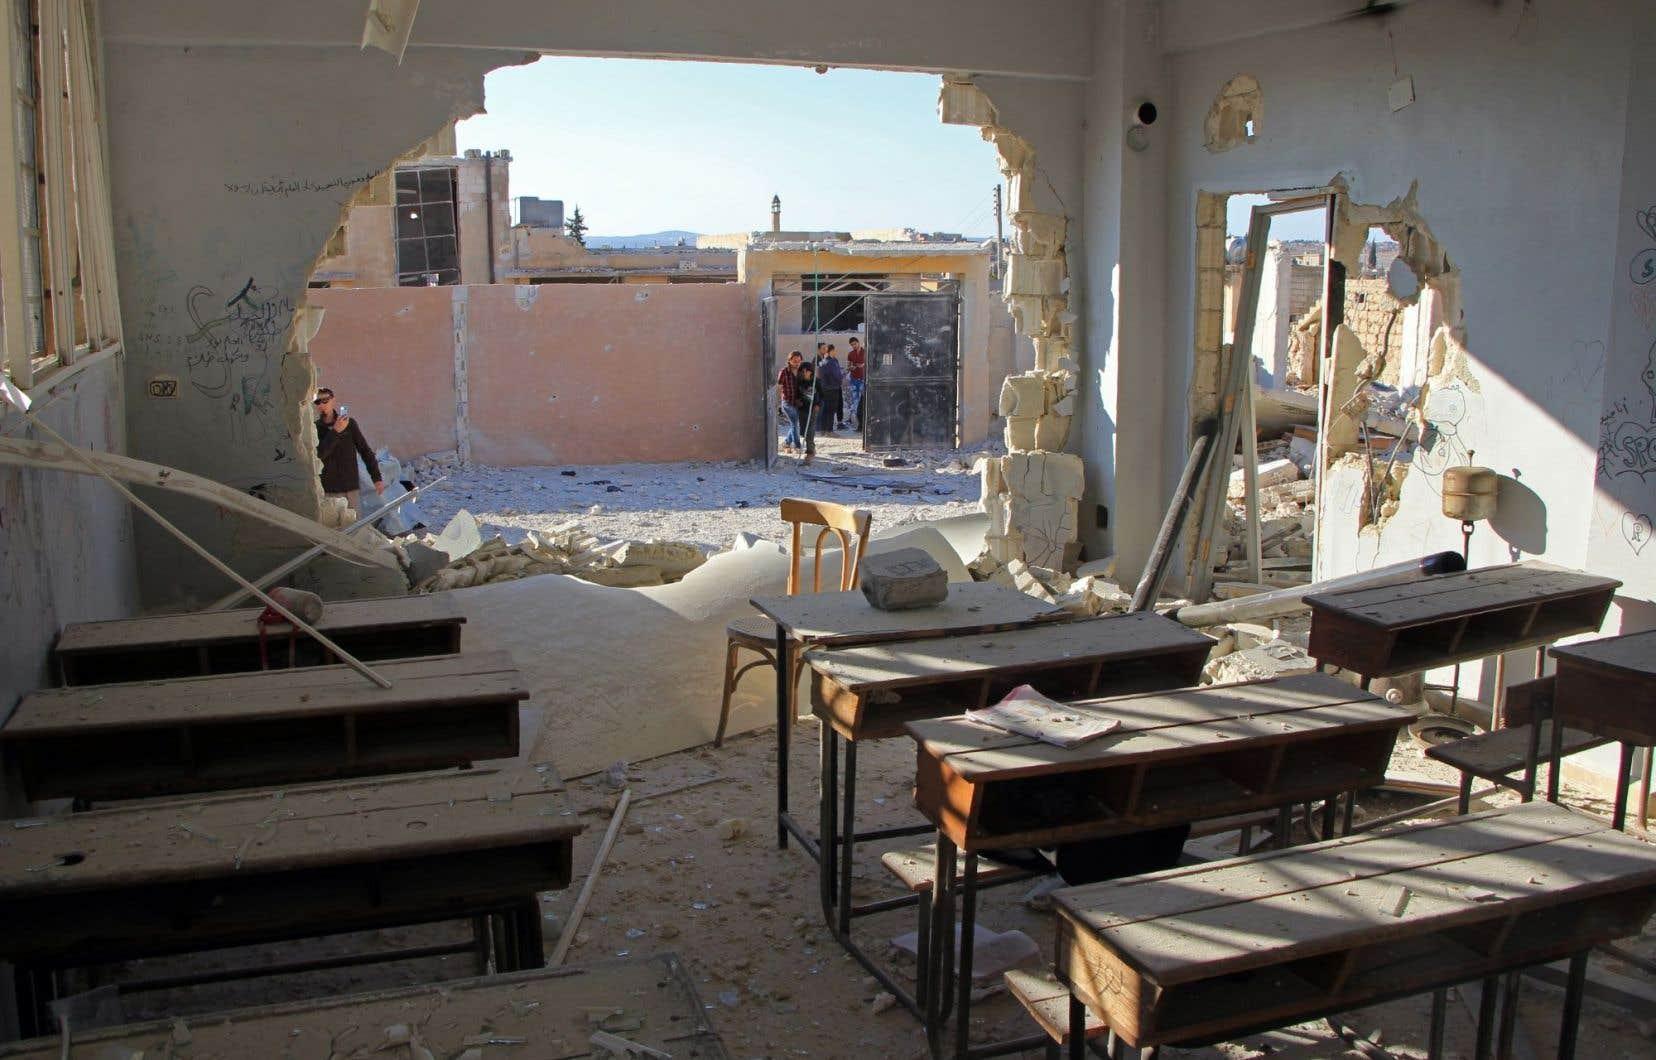 L'école bombardée jeudi, où22 enfants ont été tués.